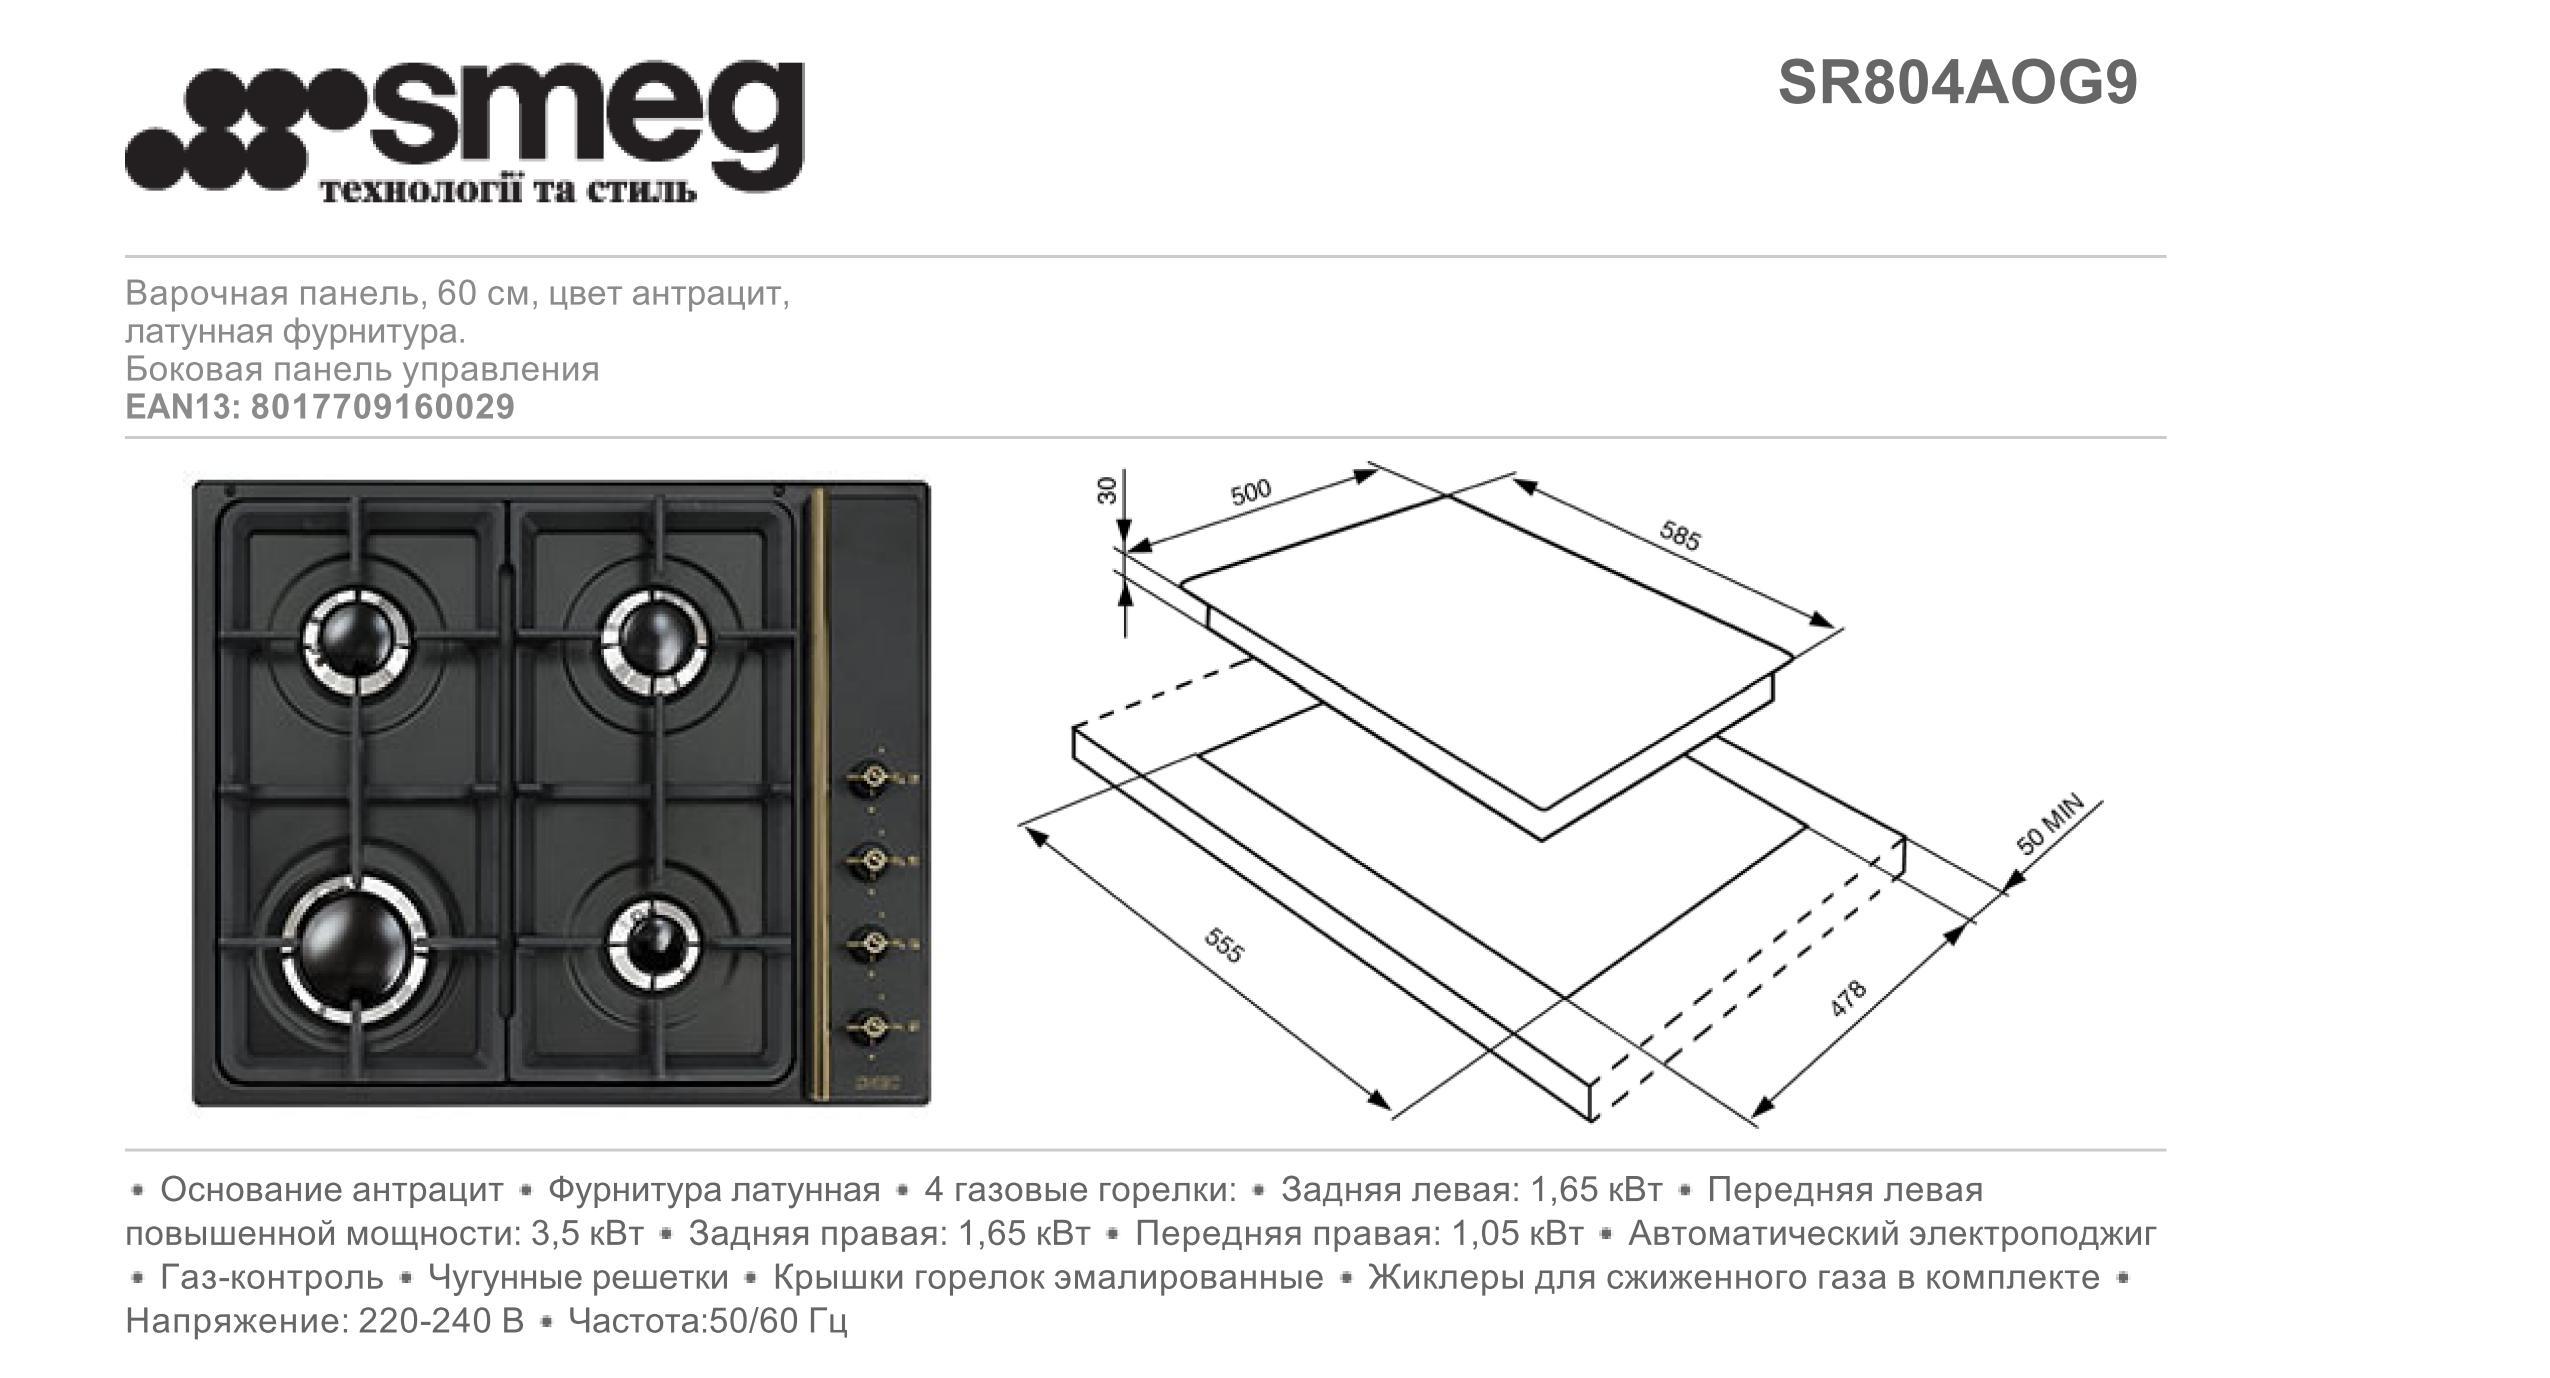 http://www.btmarket.com.ua/img_upl2/SR804AOG9_mini.jpg